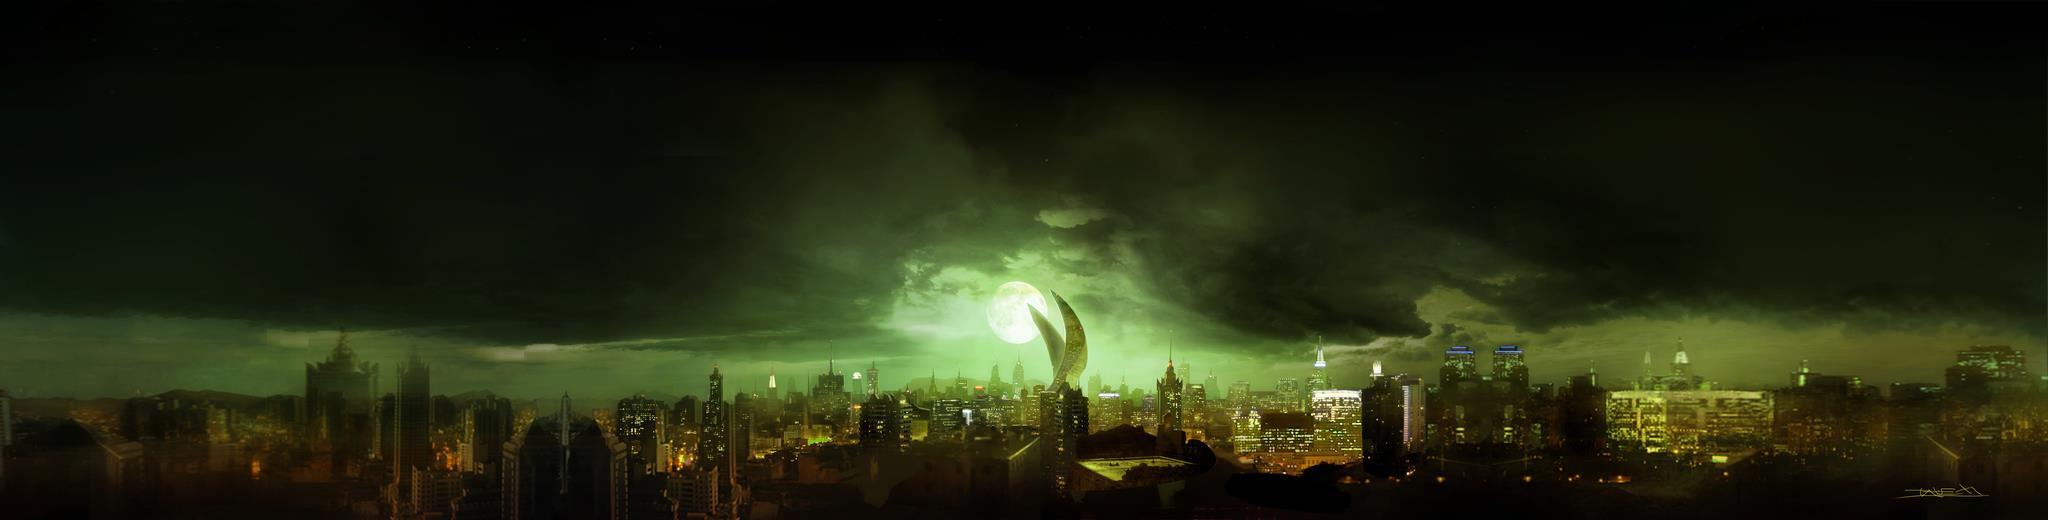 Devil May Cry Artworks 6 تصاویرهنری جدید Devil May Cry نشان از ذوق هنری در بازی میدهد